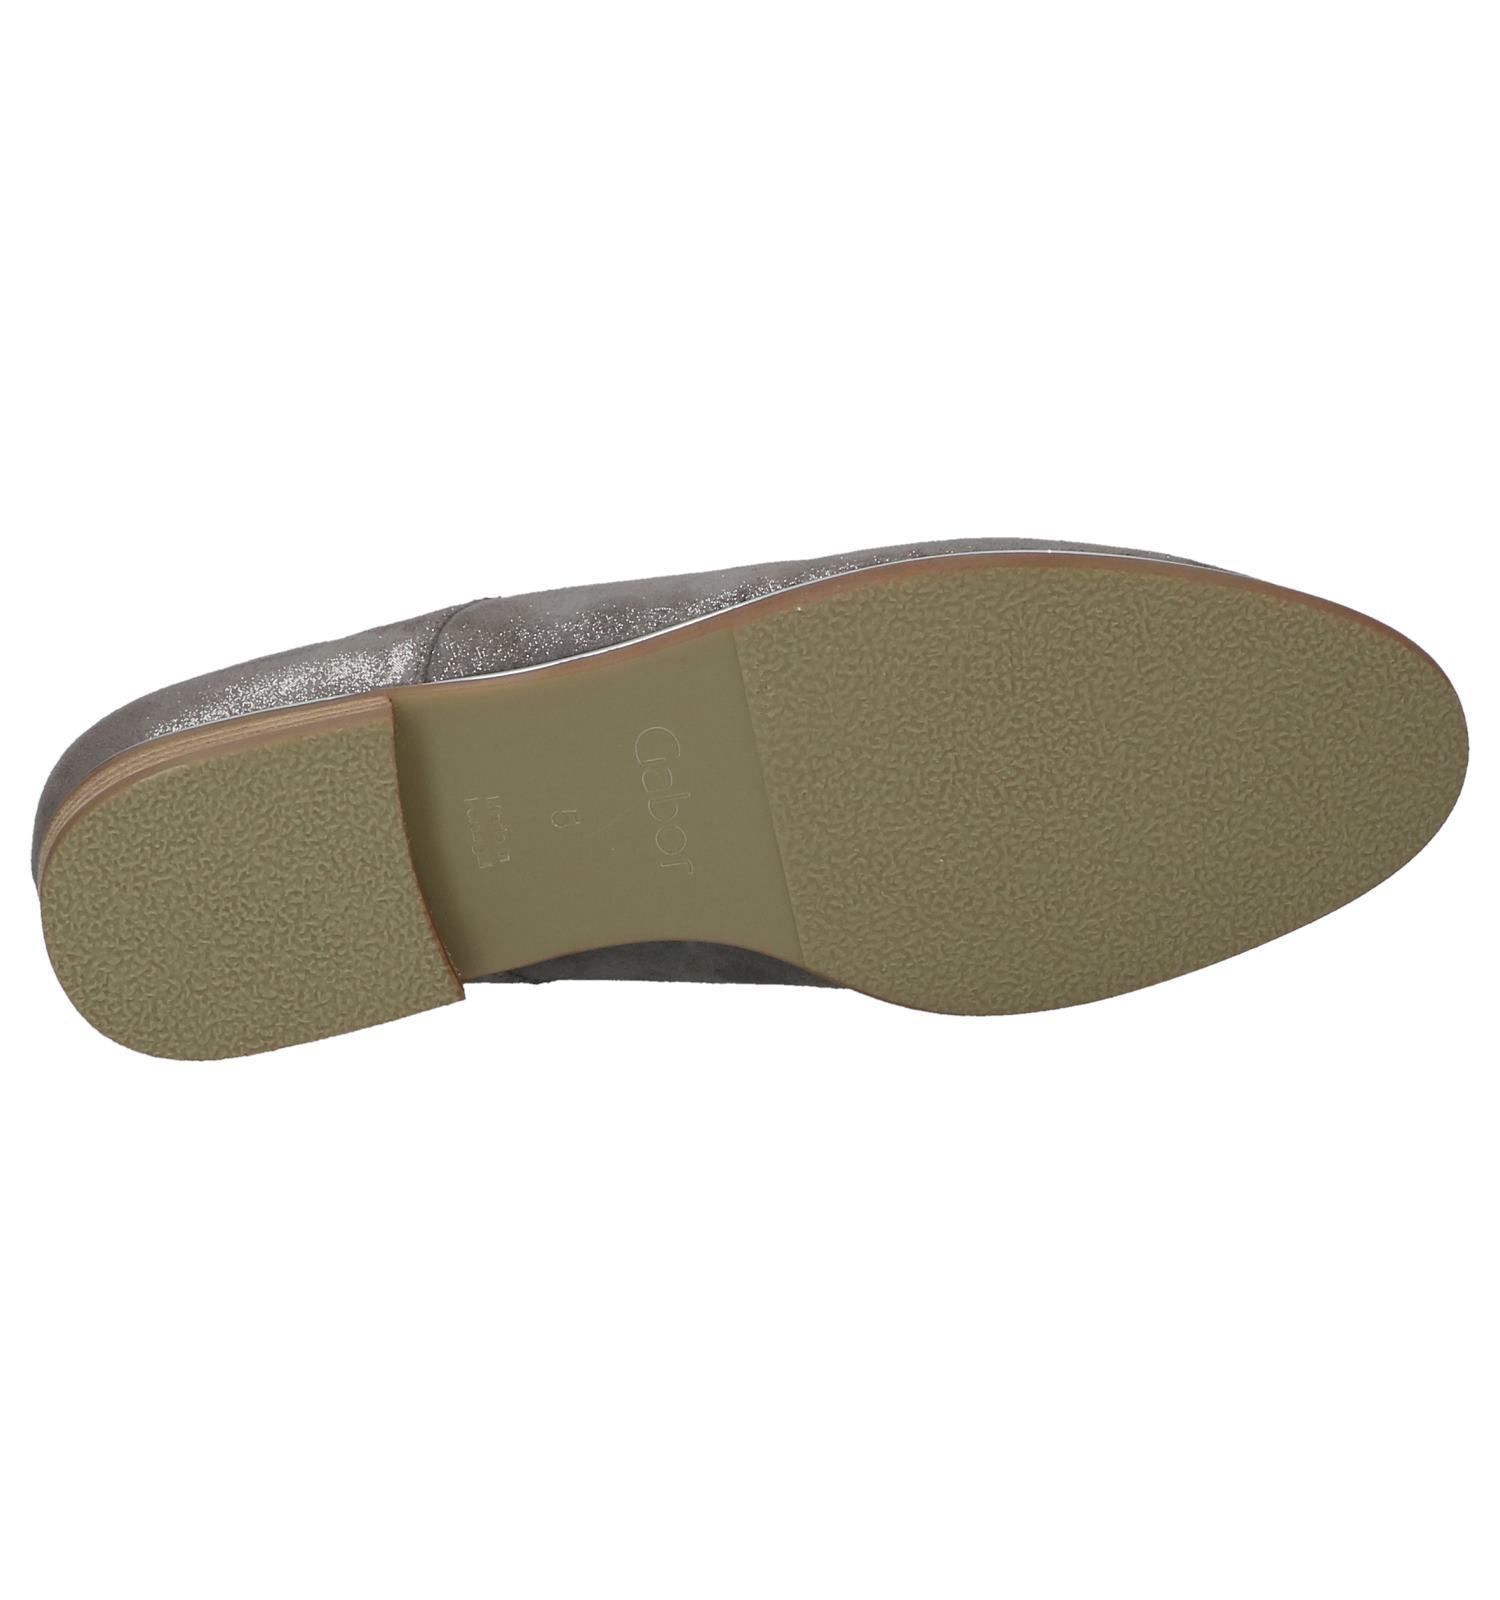 Optifit Comfortabele Comfortabele Grijze Veterschoenen Grijze Gabor Veterschoenen Gabor Optifit Grijze mn08vNw